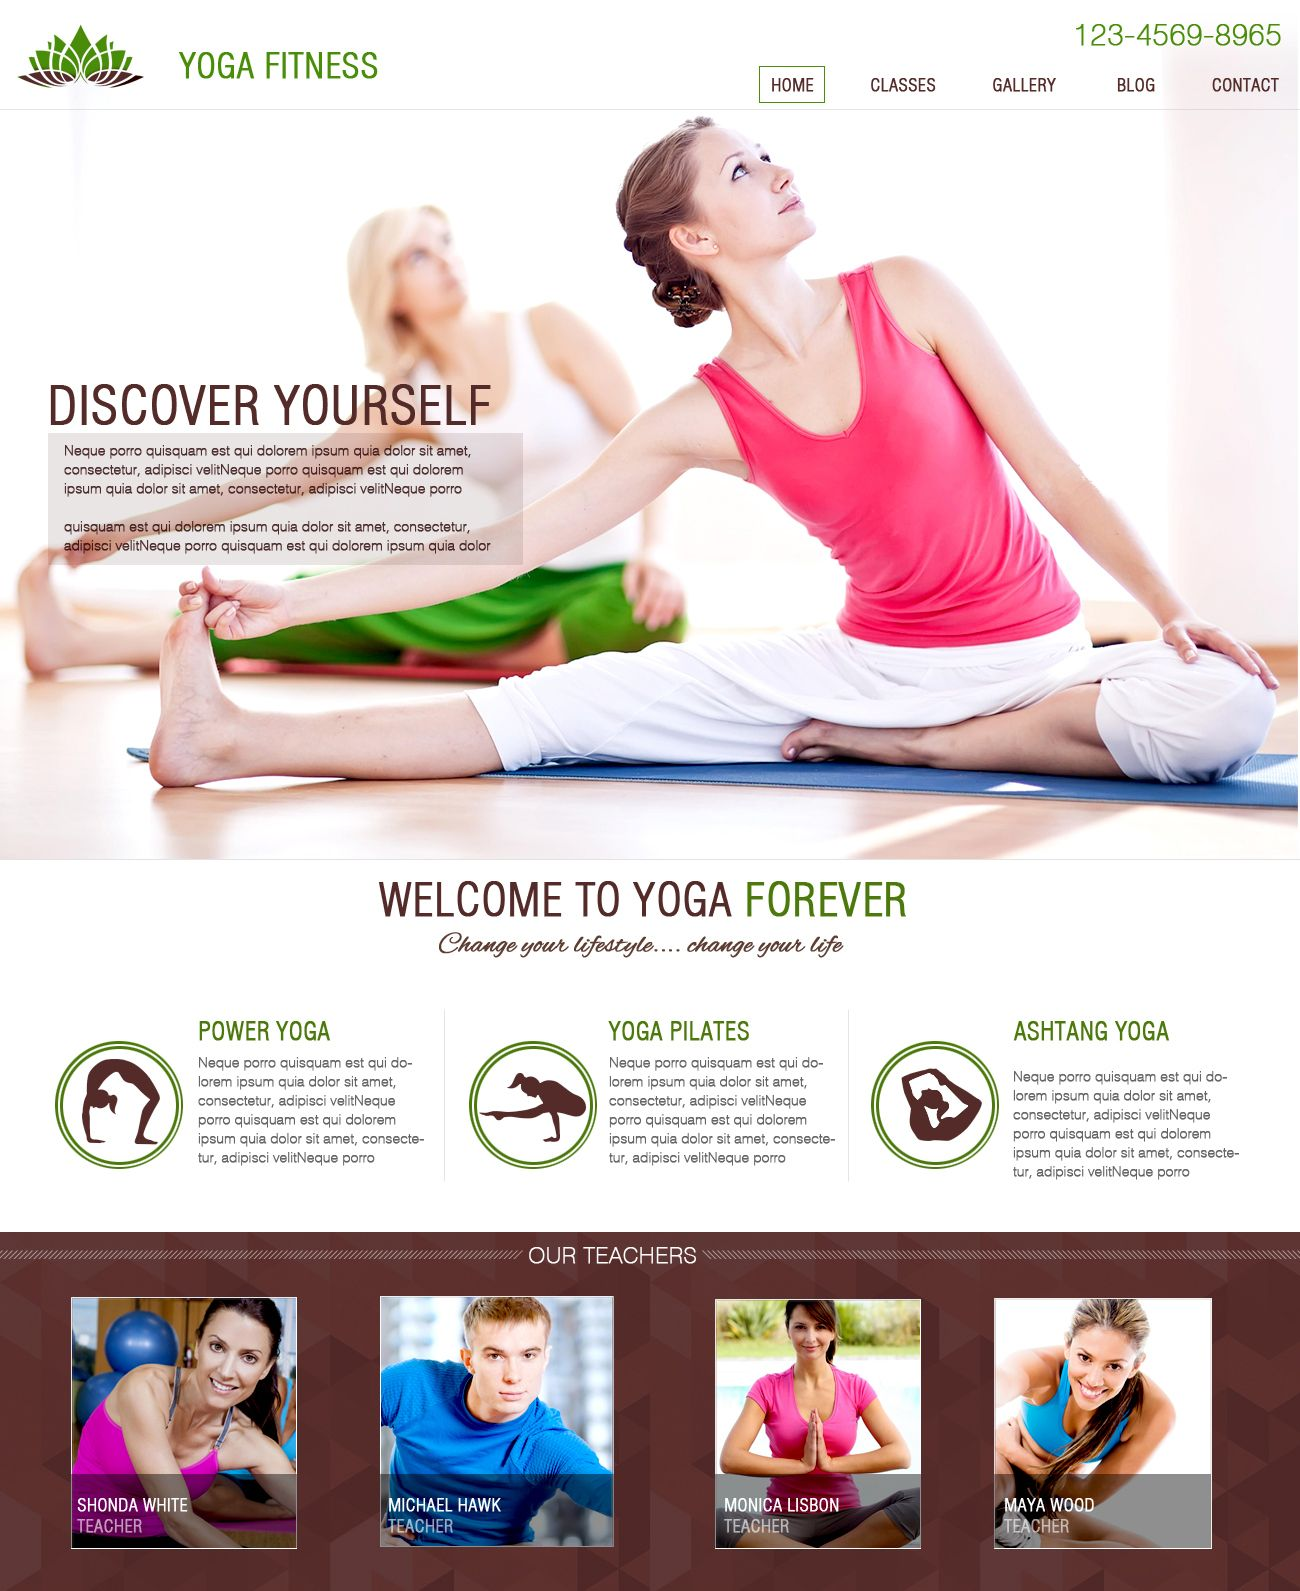 My Best Studio Yoga Web Design Firm convert your site